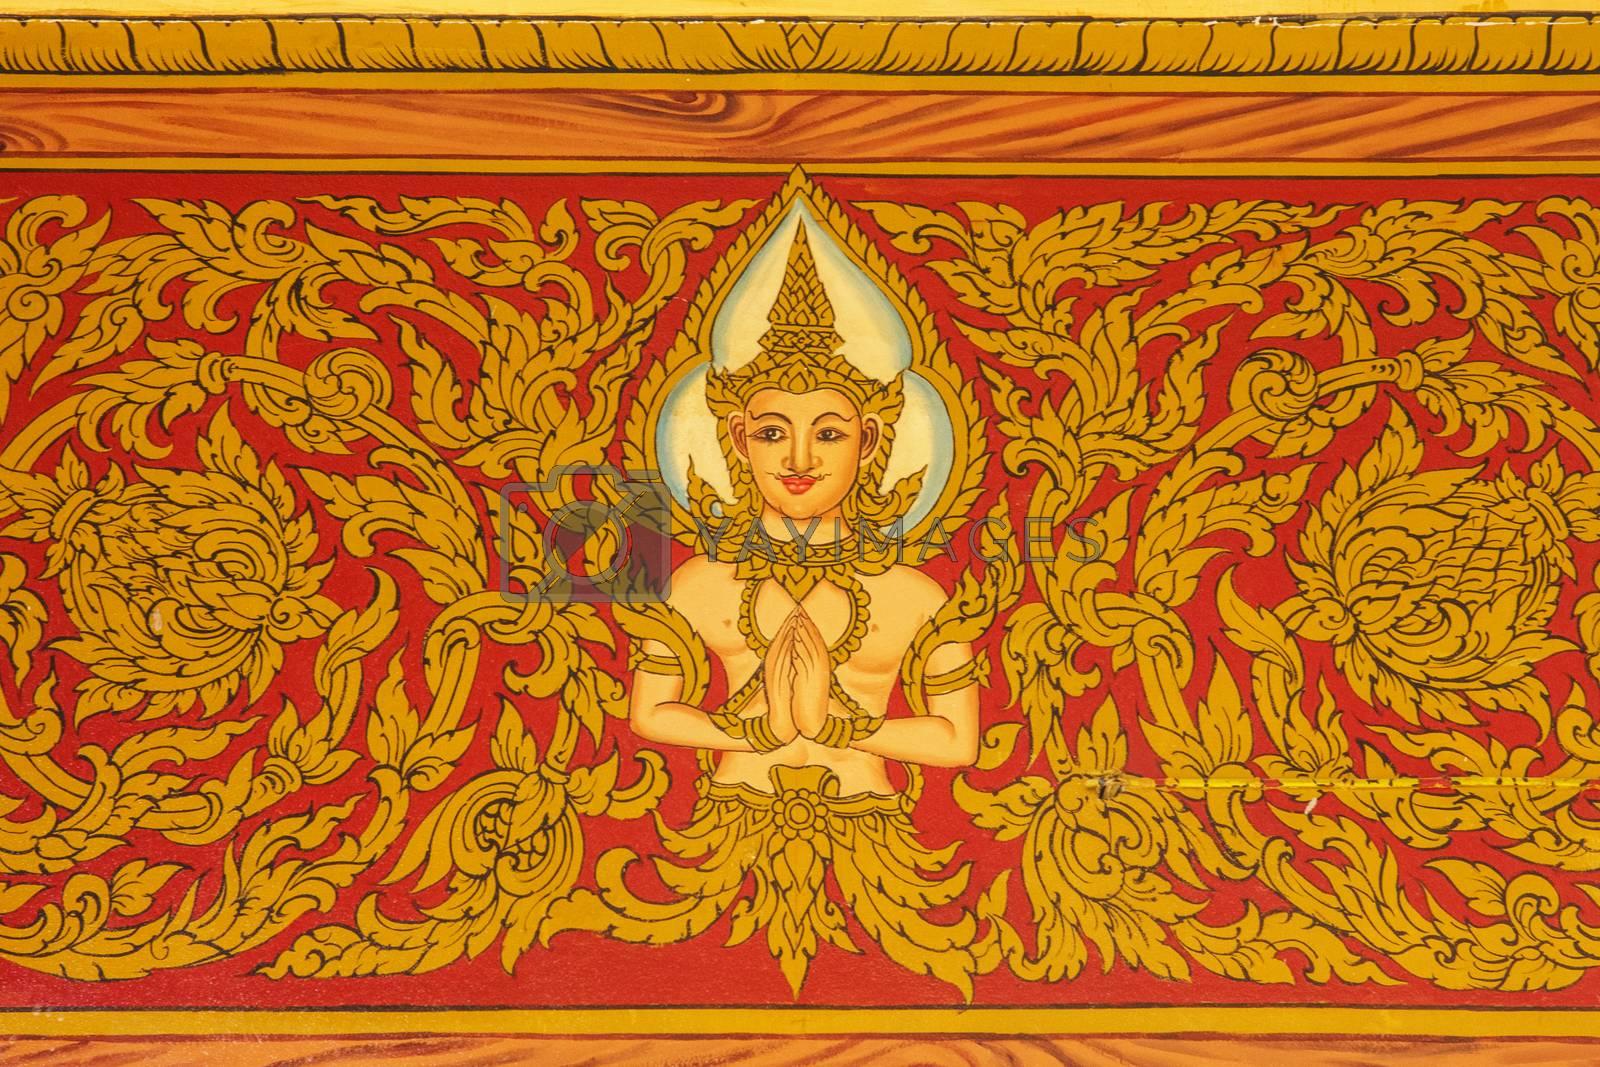 Royalty free image of thai pattern by nattapatt